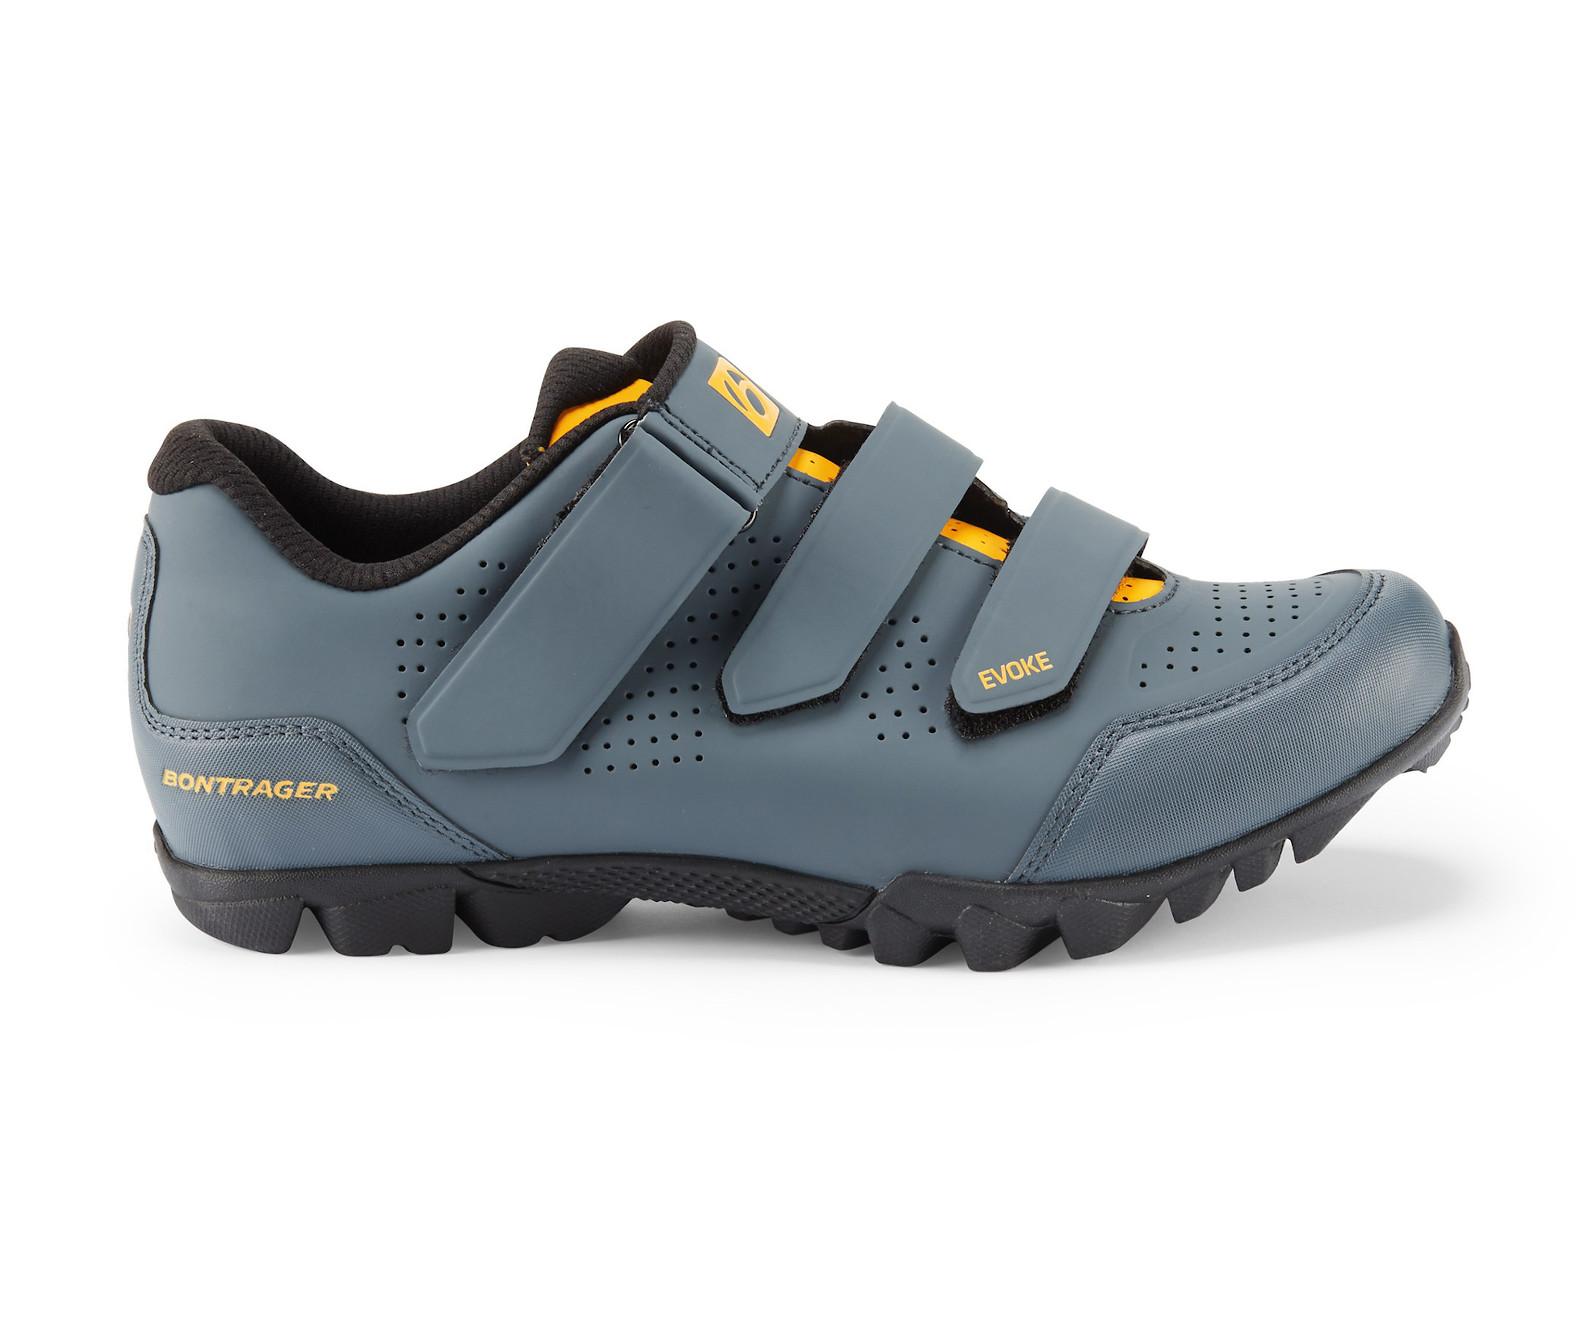 Bontrager Evoke Mountain Shoe (Battleship Blue/Marigold)